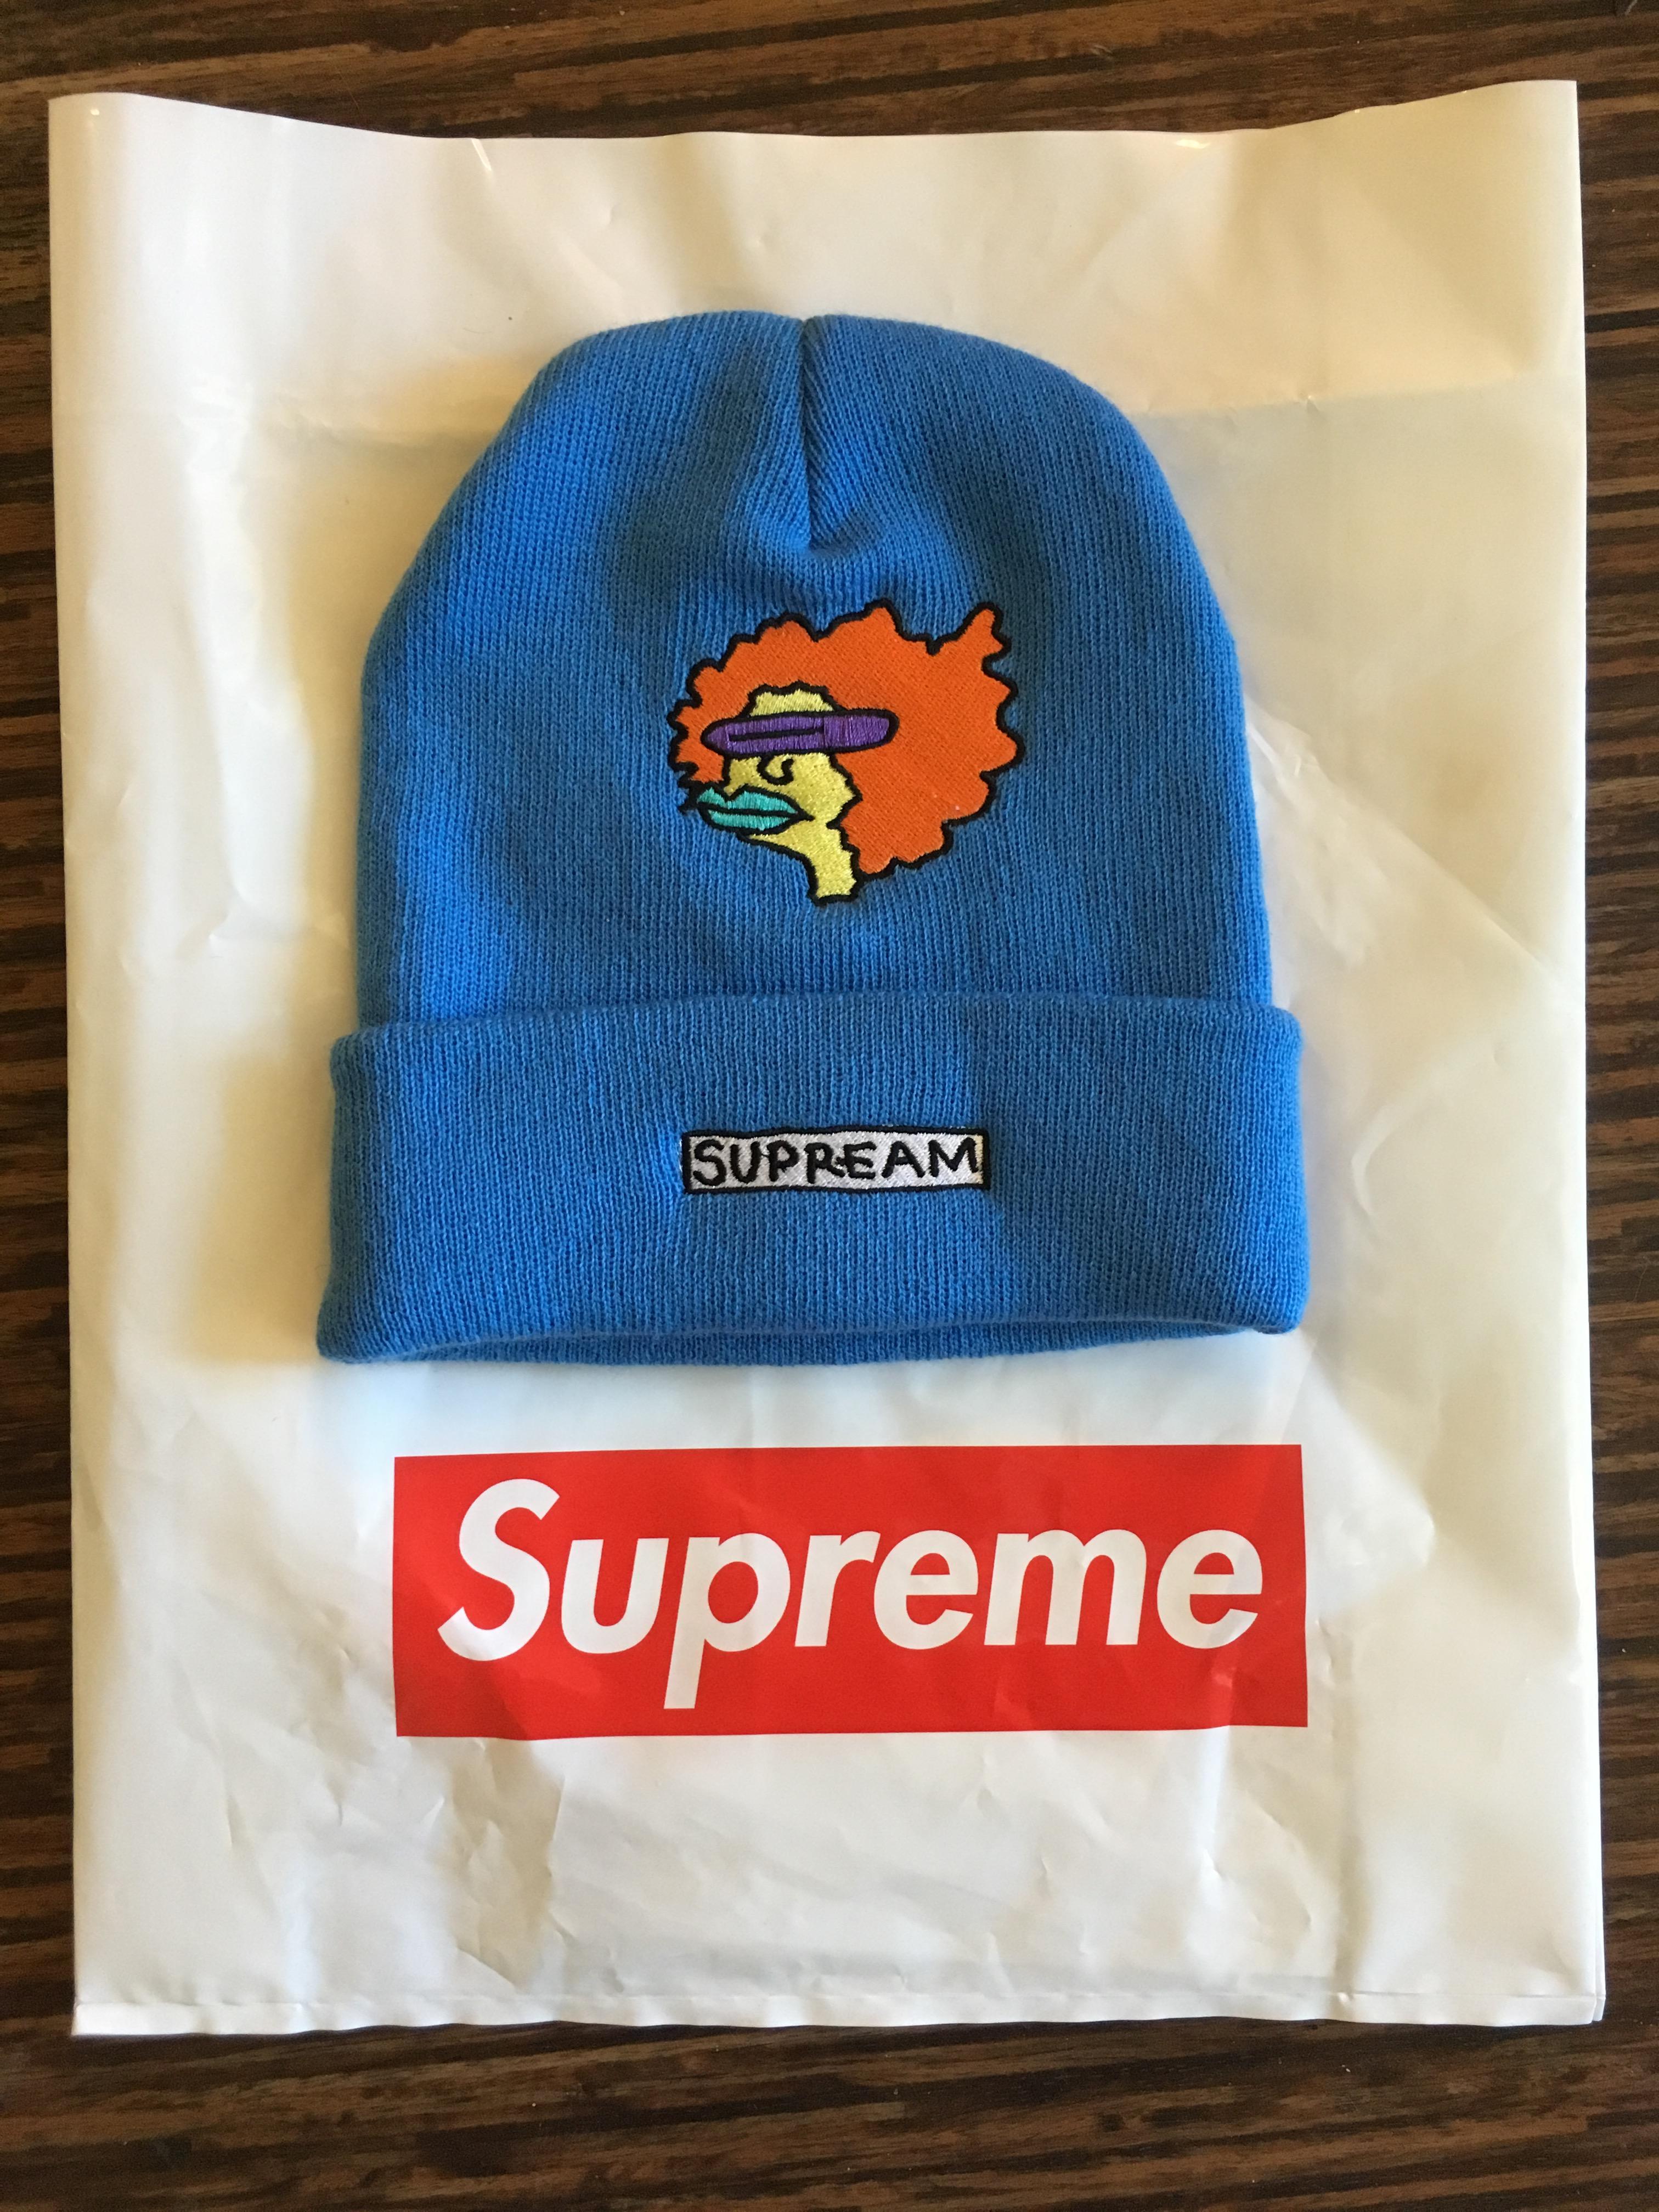 Supreme Supreme x Gonz Ramm Beanie Light Blue Size one size - Hats for Sale  - Grailed e2eaf5034af7